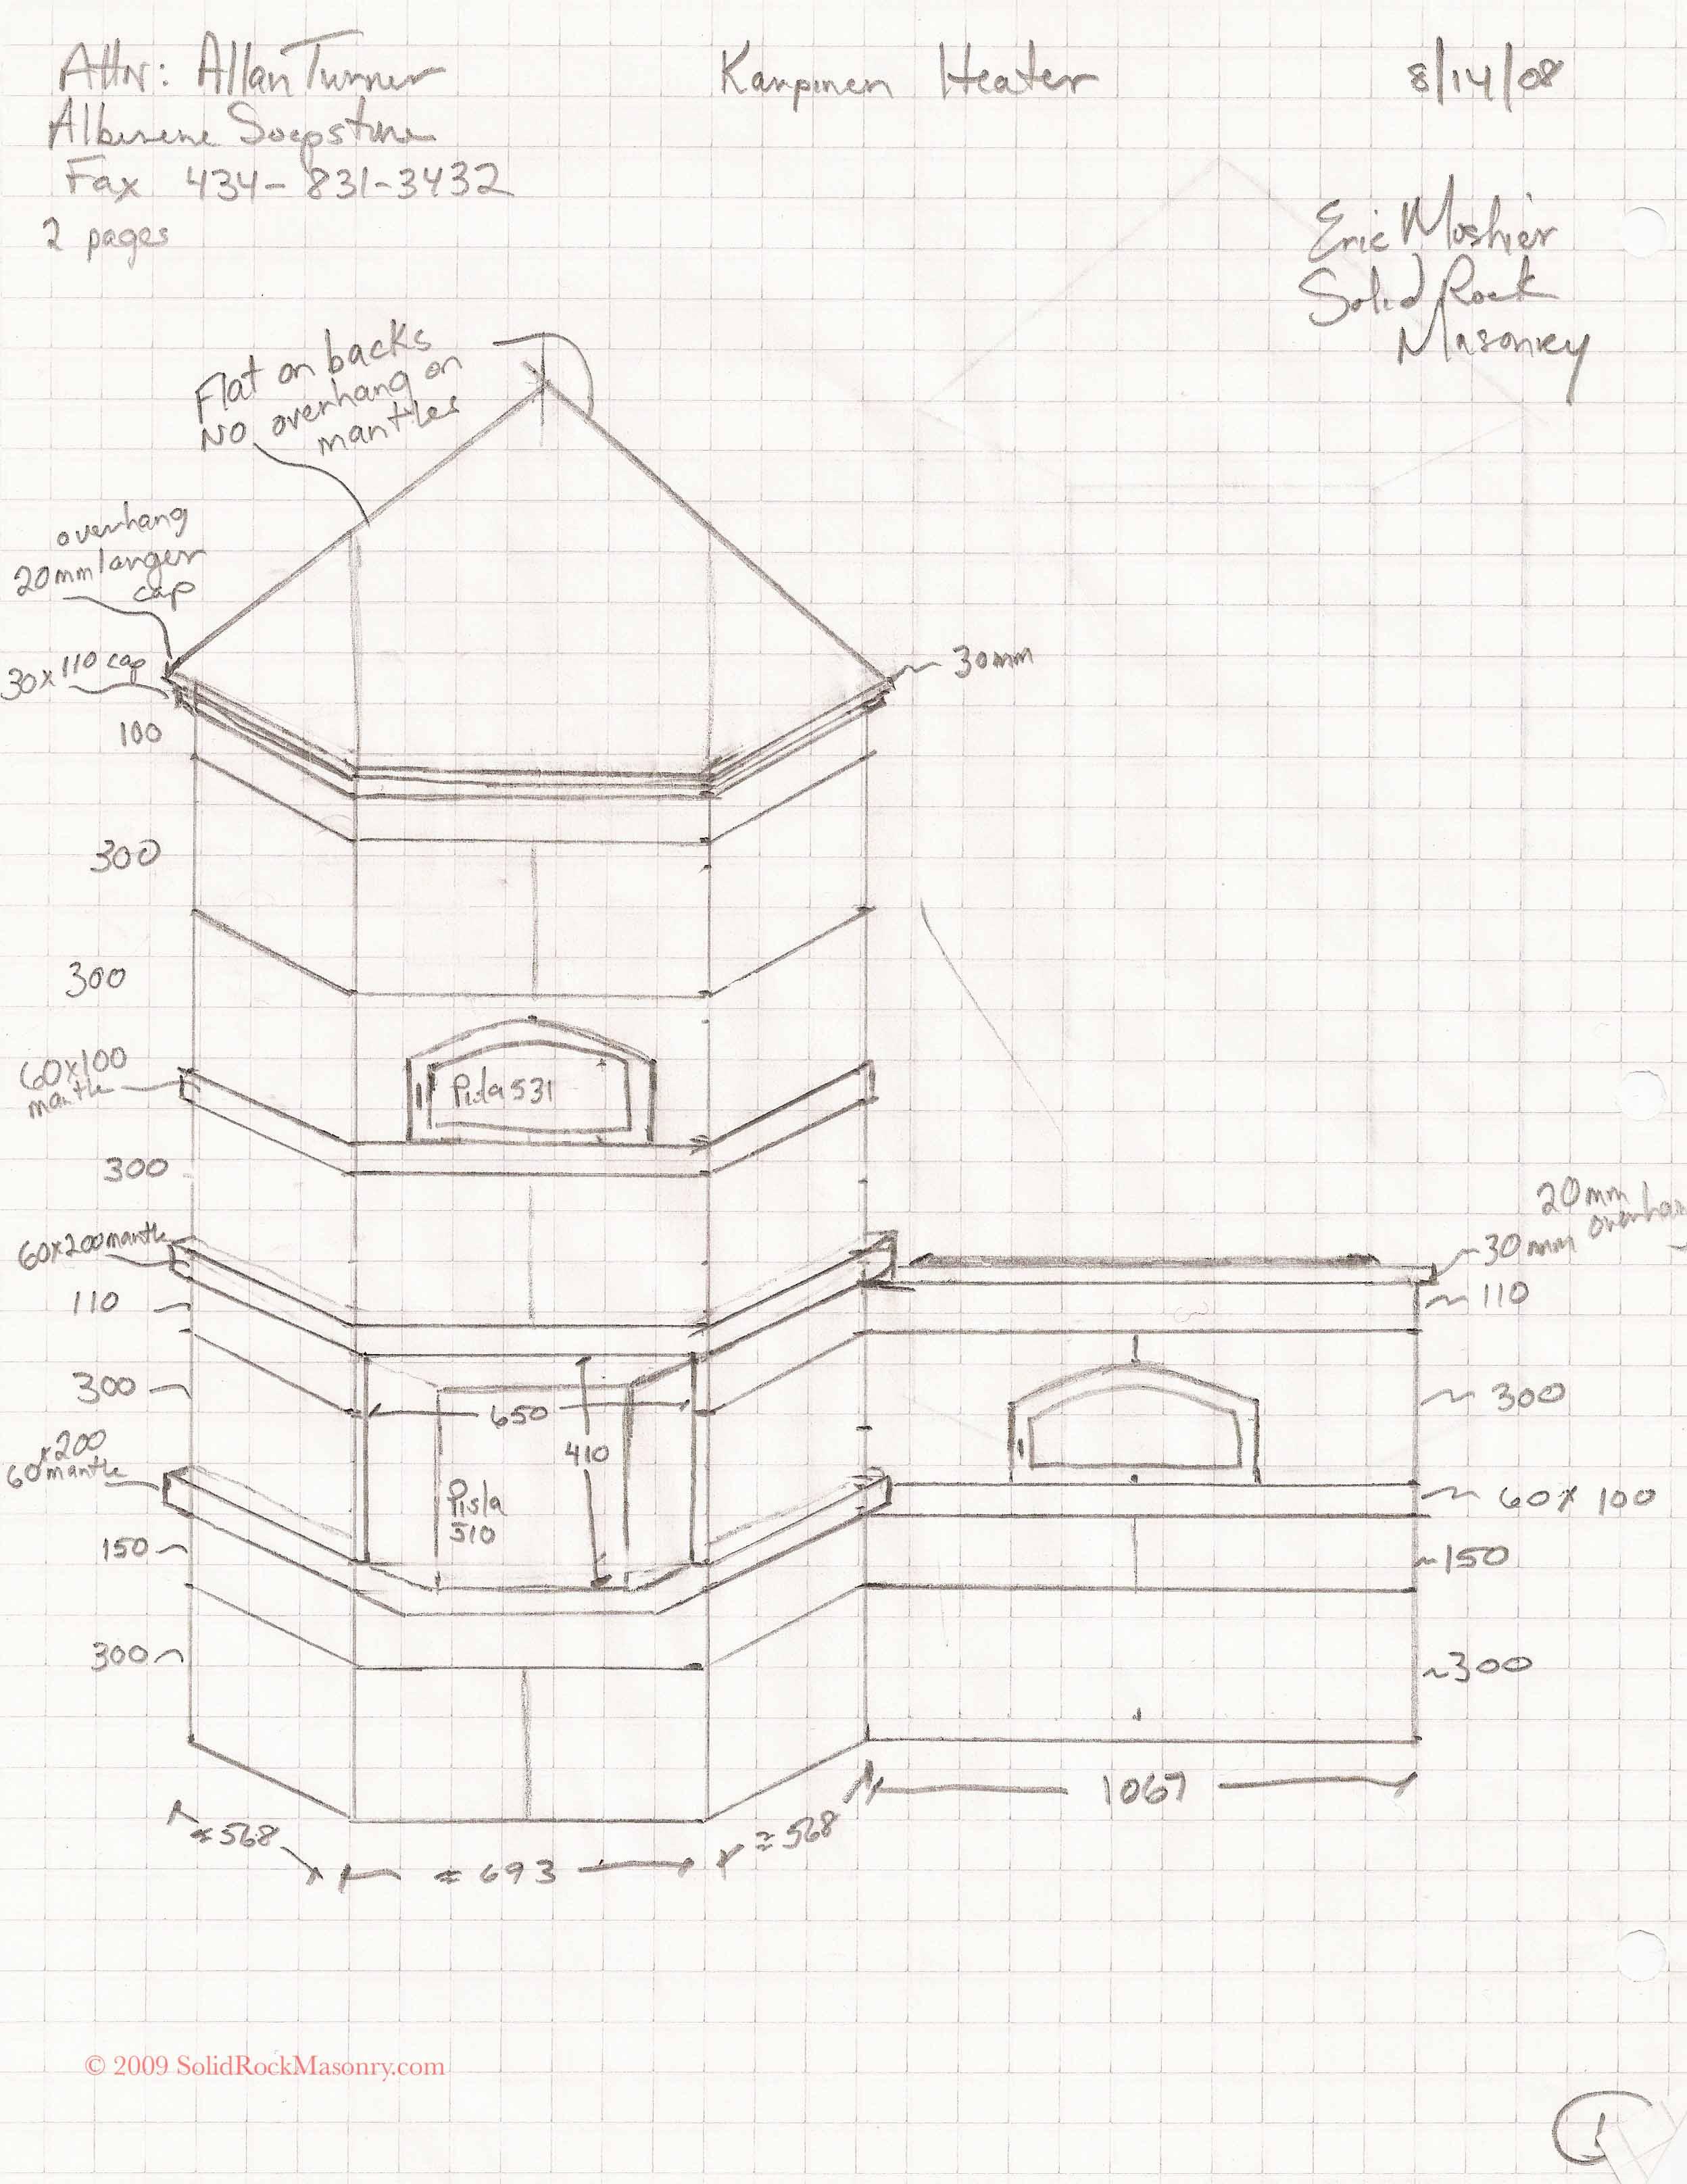 Karpinen Masonry Heater And Cookstove